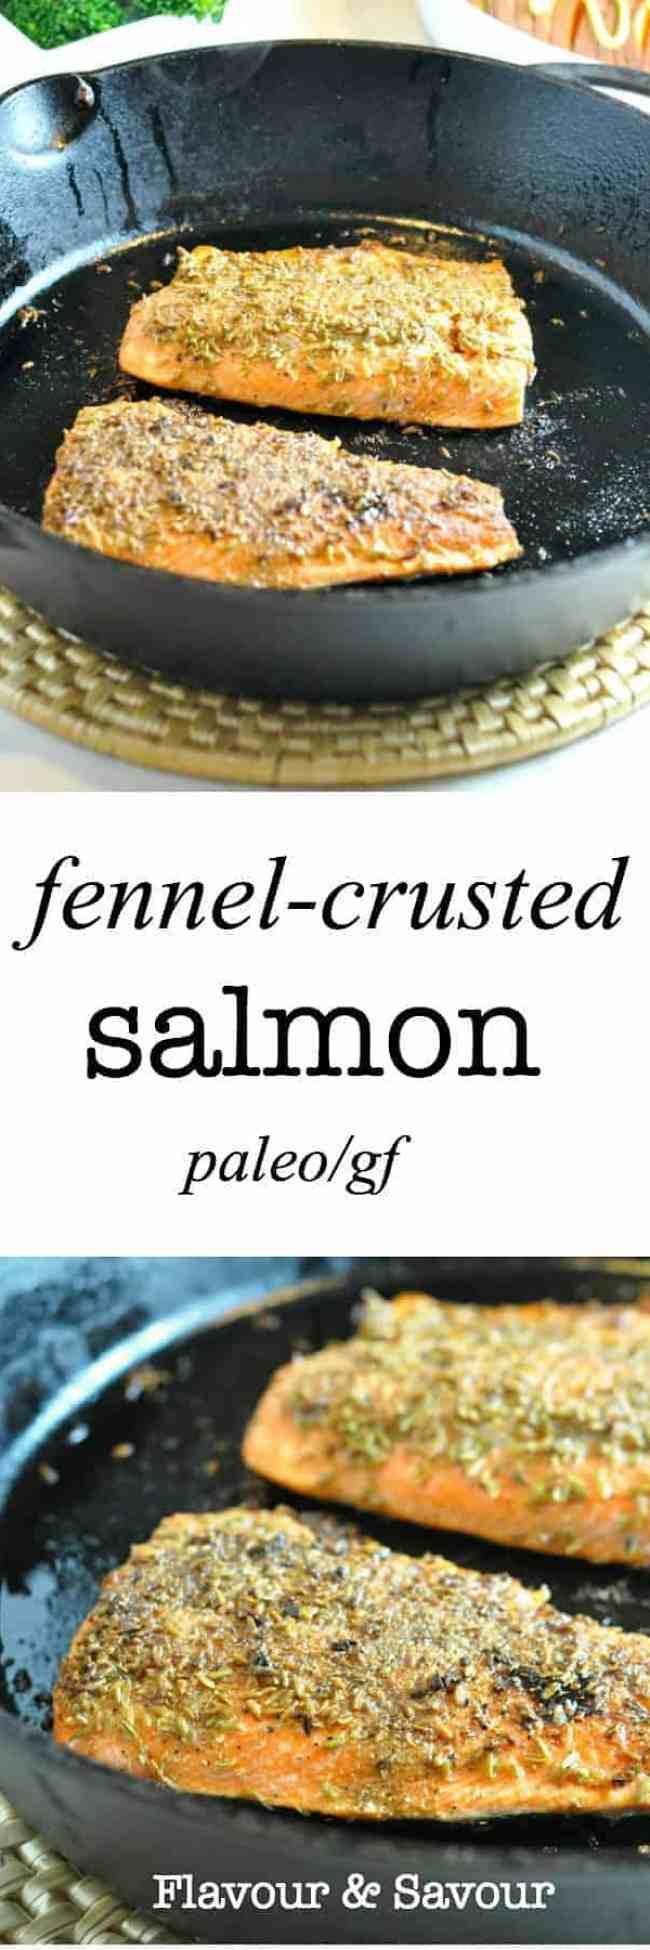 Paleo Fennel-Crusted Salmon.